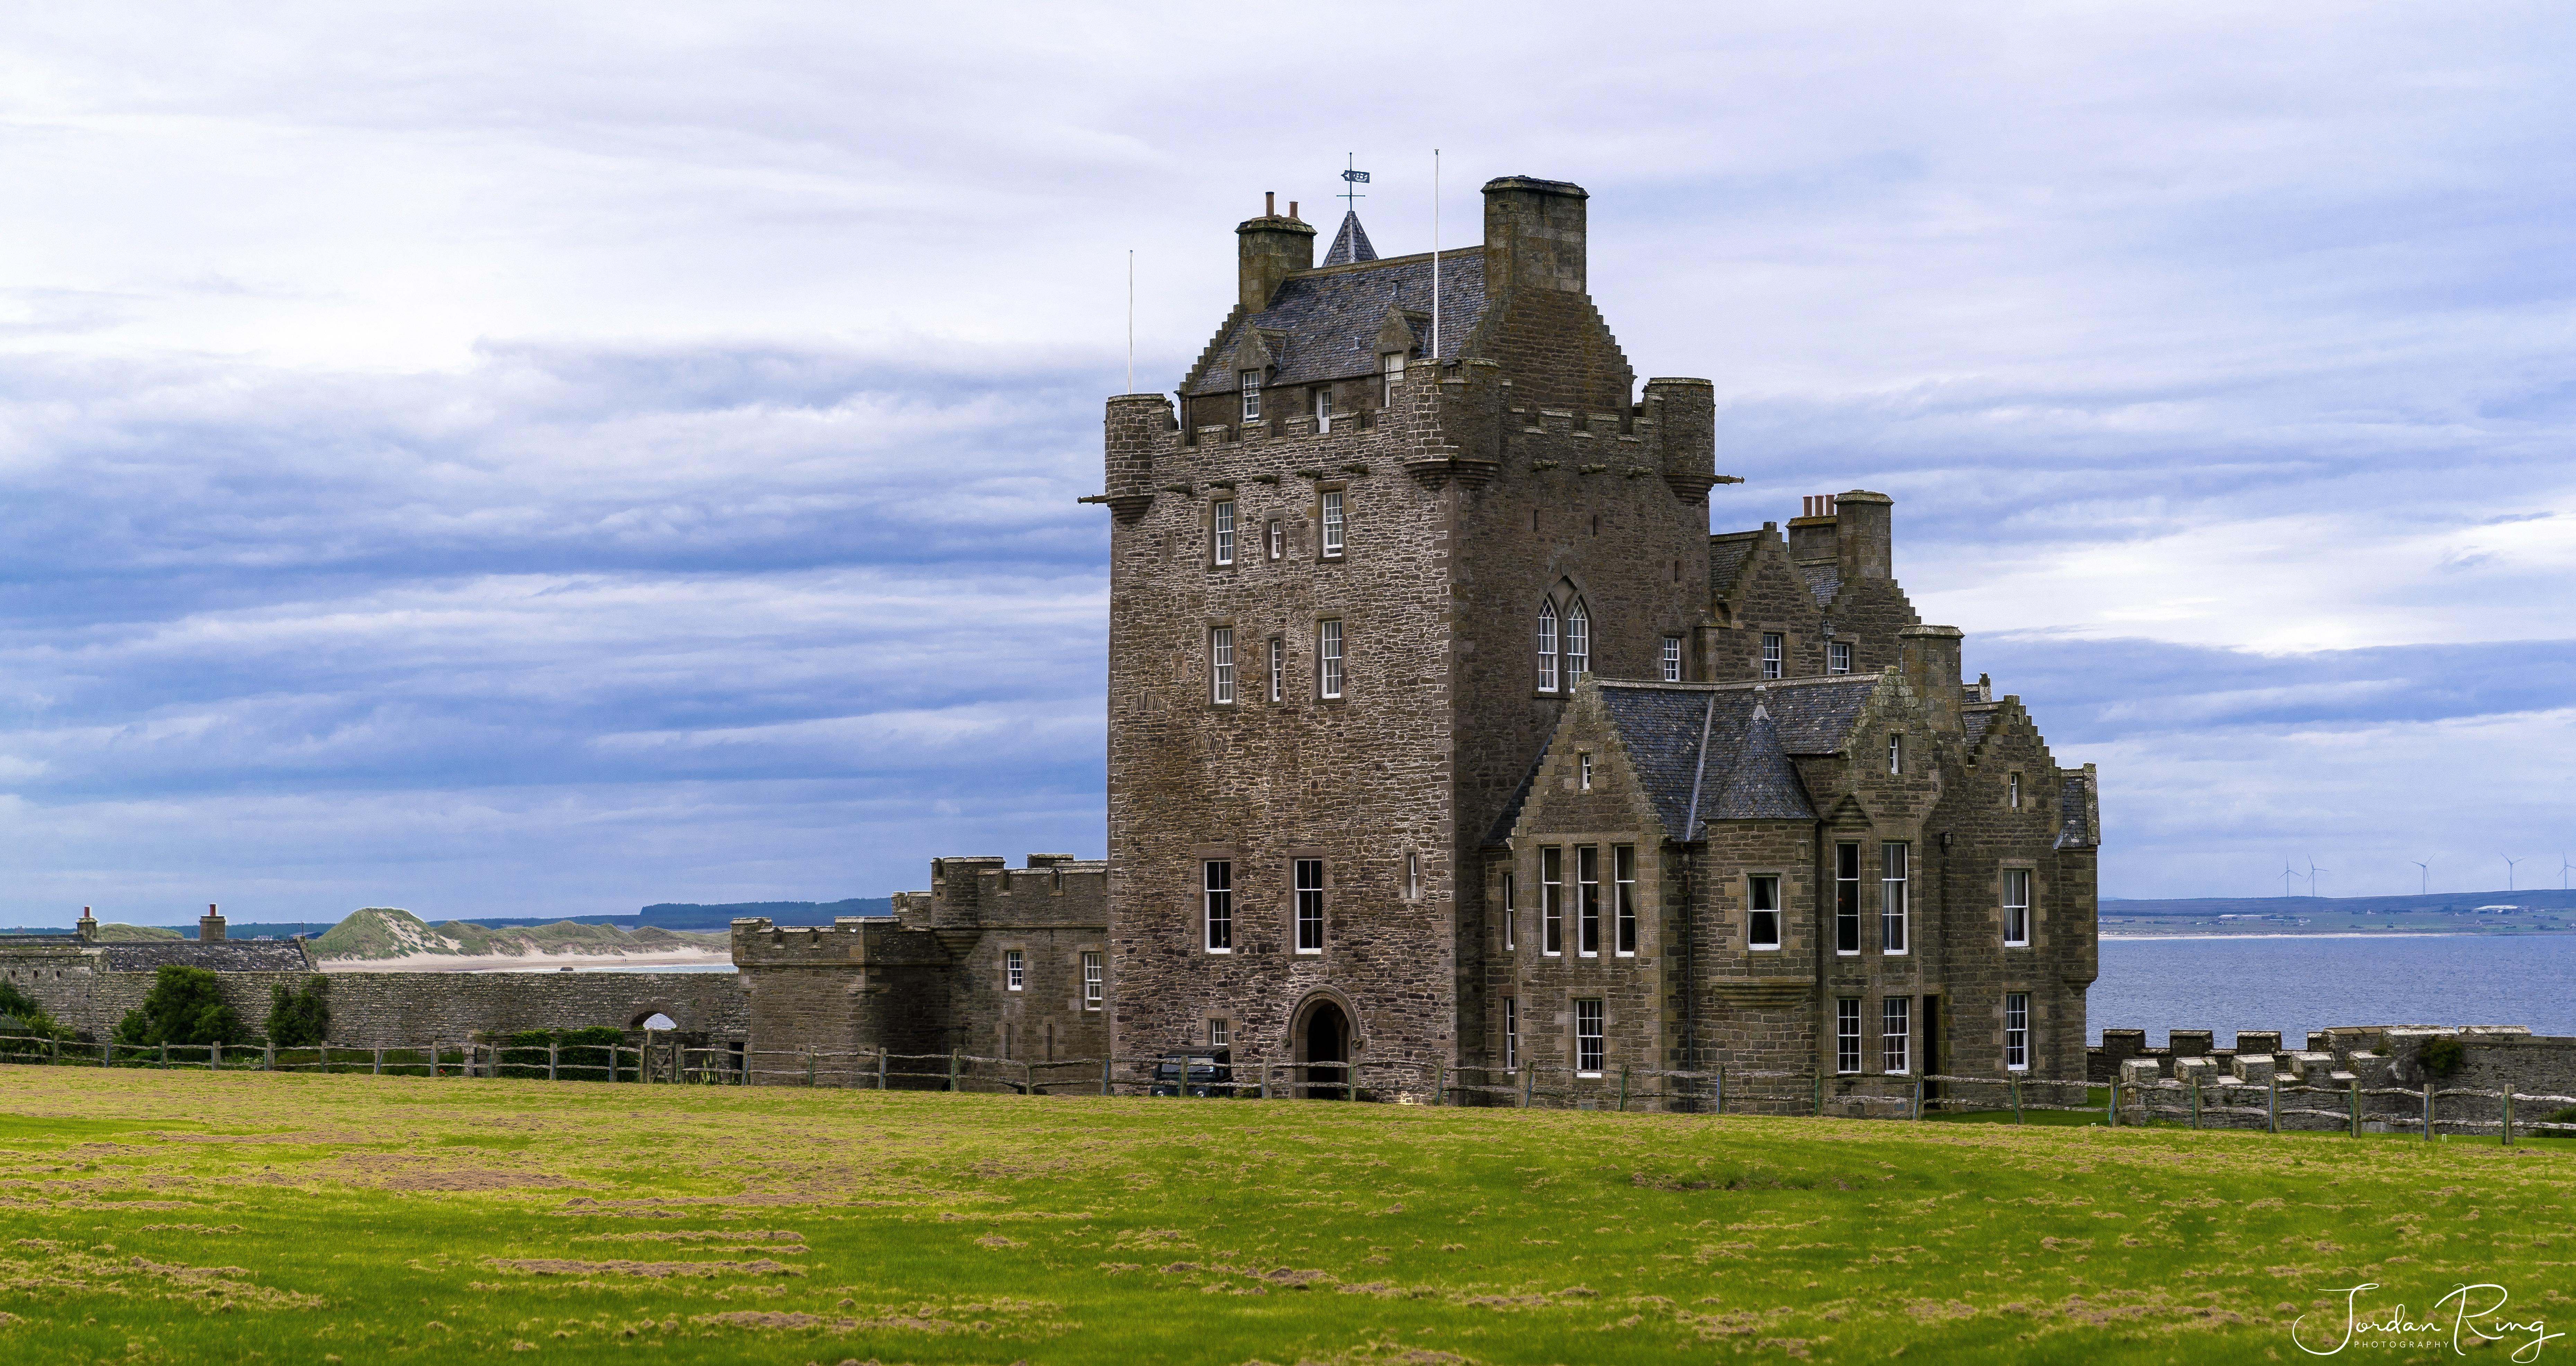 Ackergill Castle